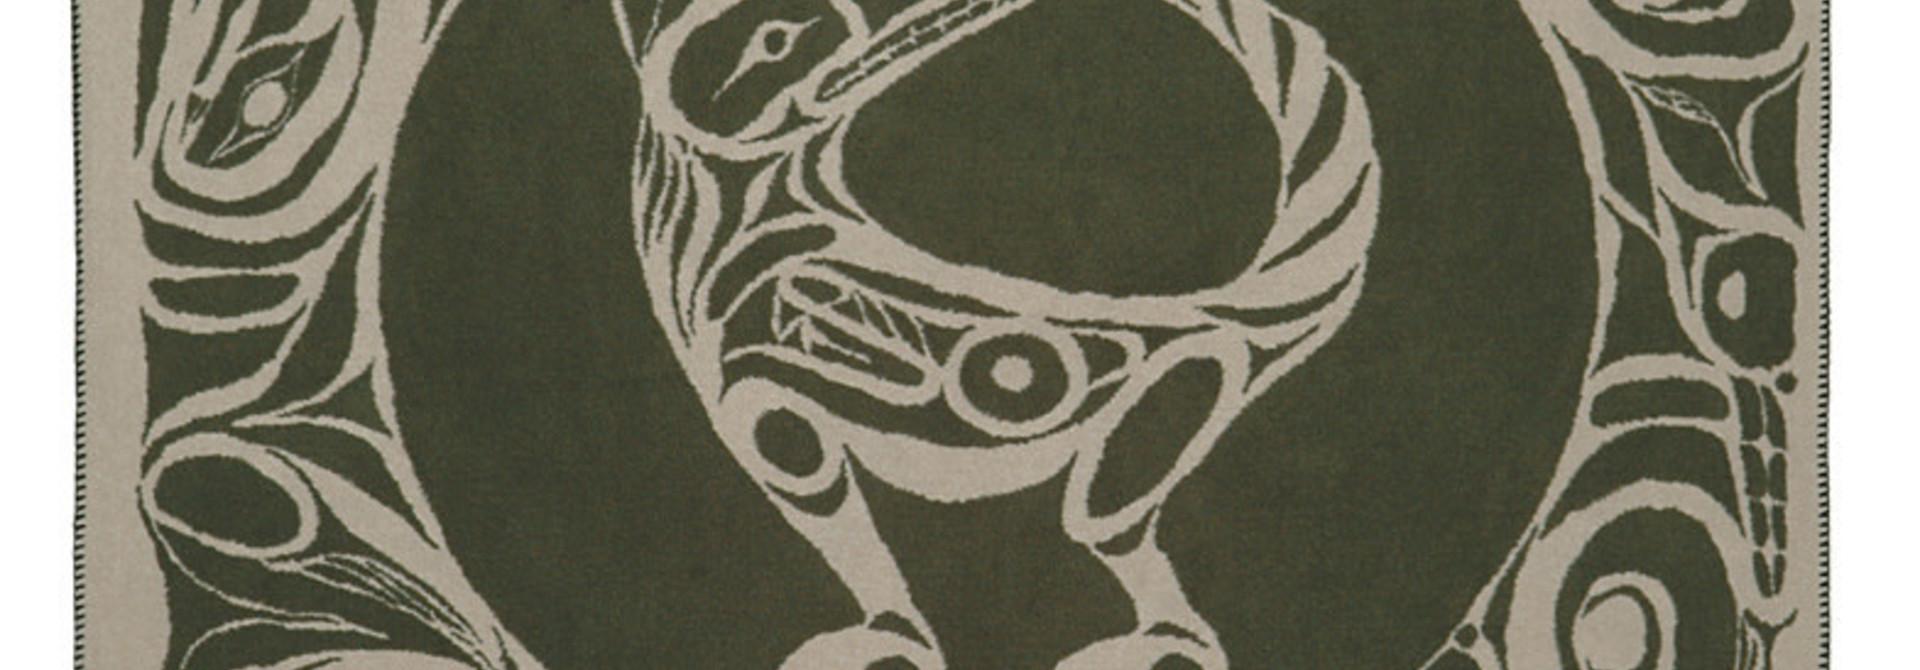 Kanata Blanket-Wolf (green/tan) by Bill Helin